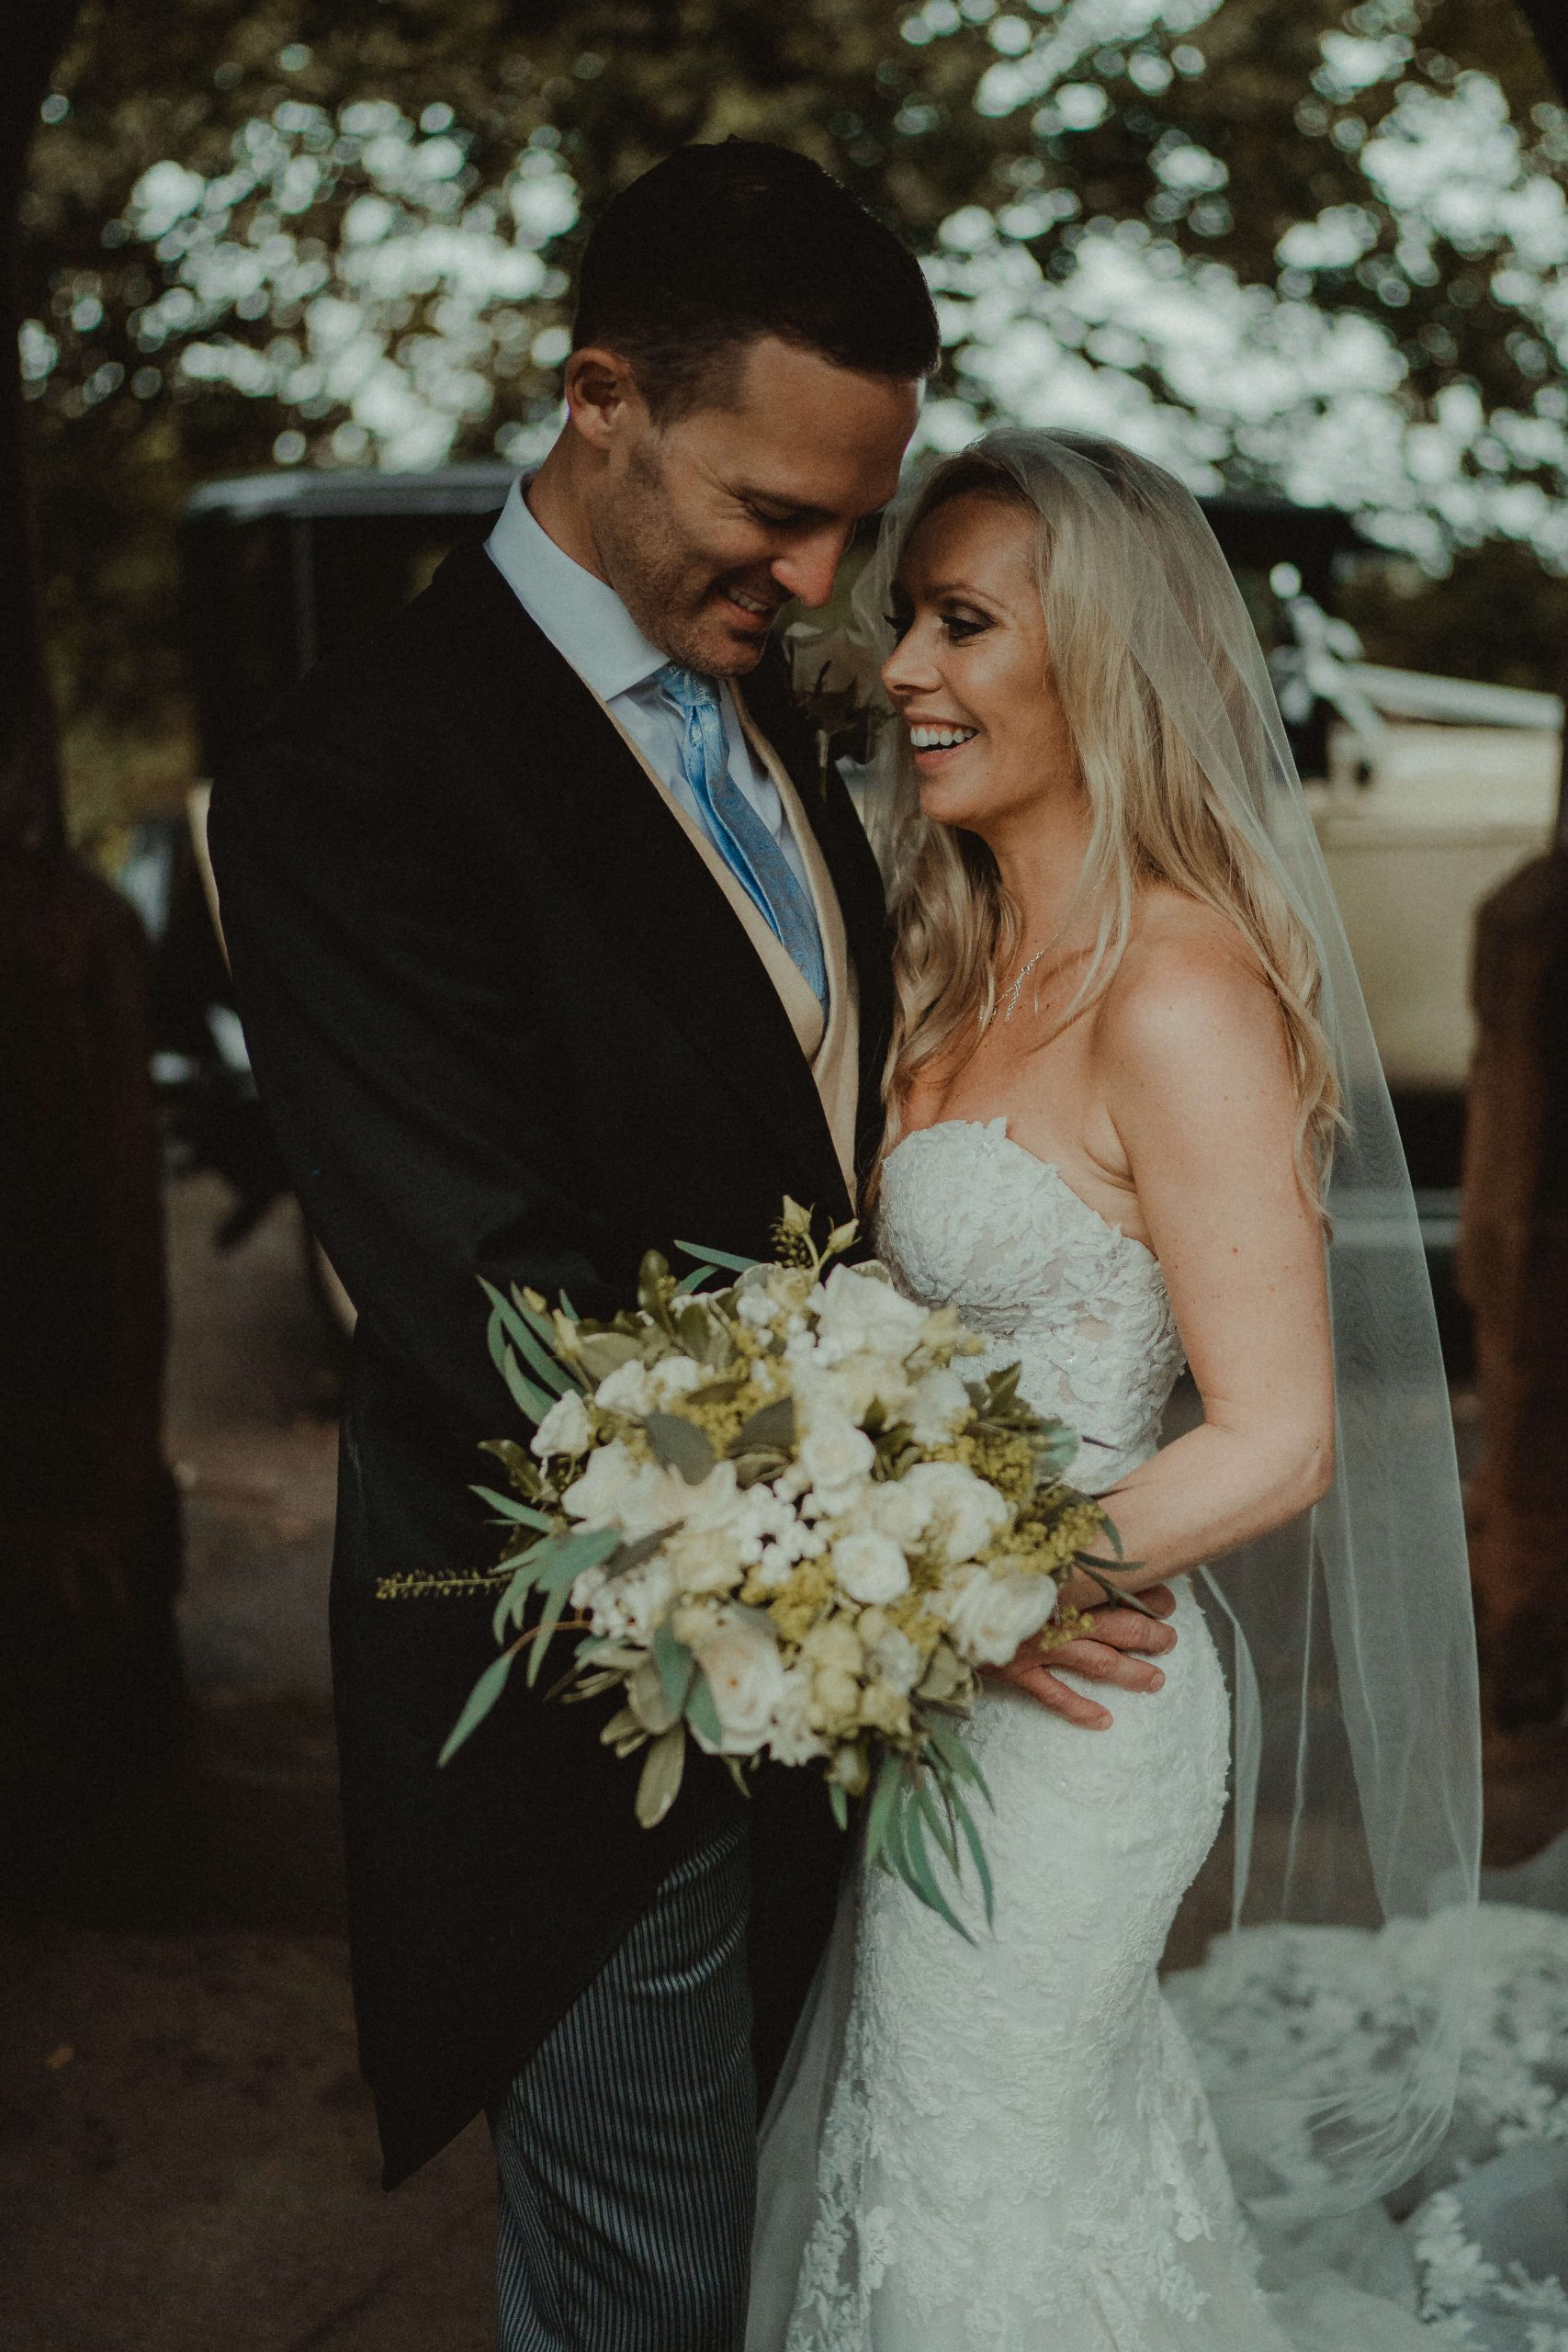 wedding-photographer-and-videographer-Weston-park-09